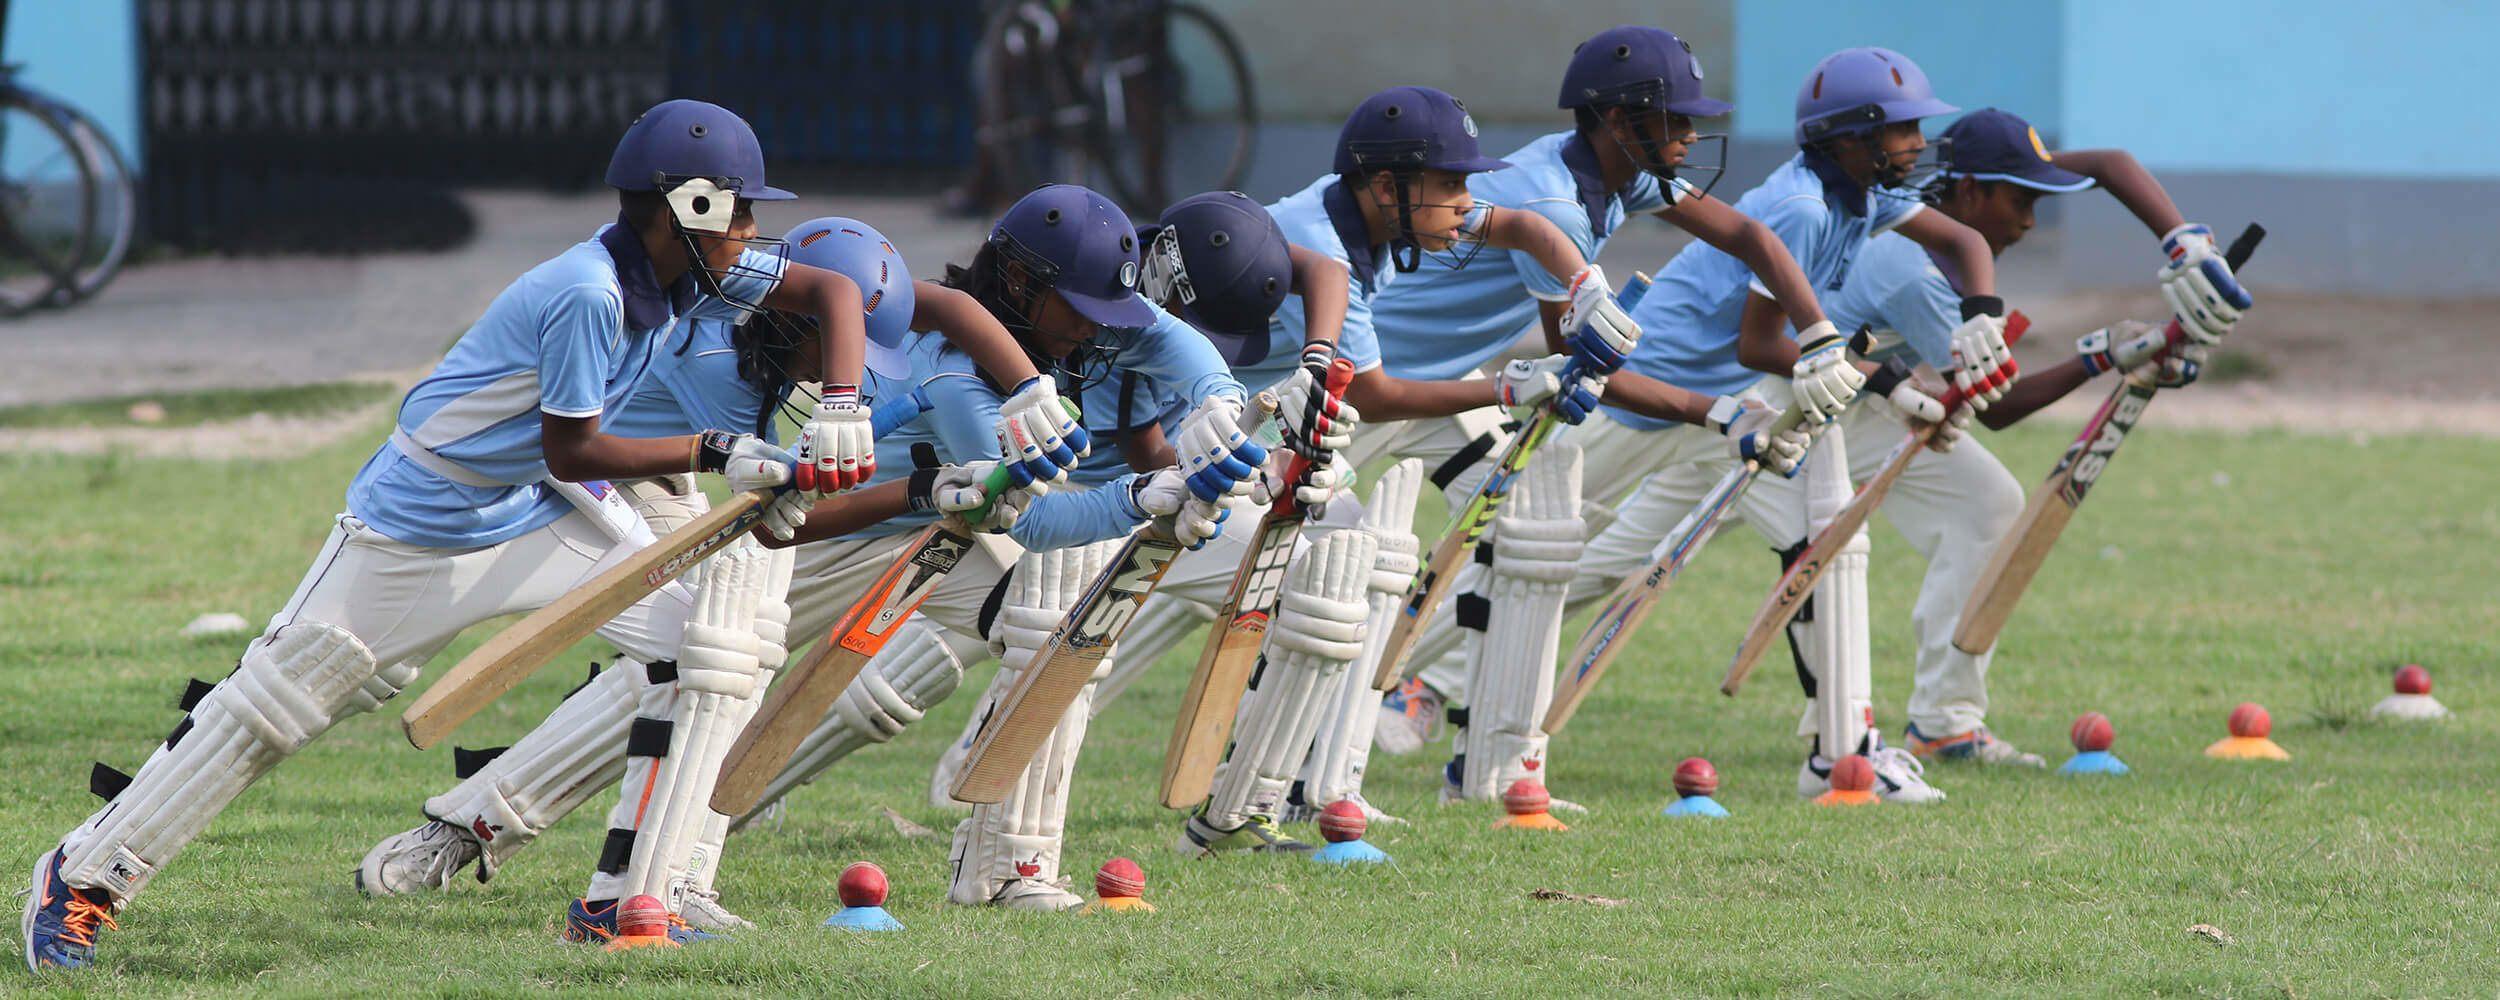 Indian Cricket Academy